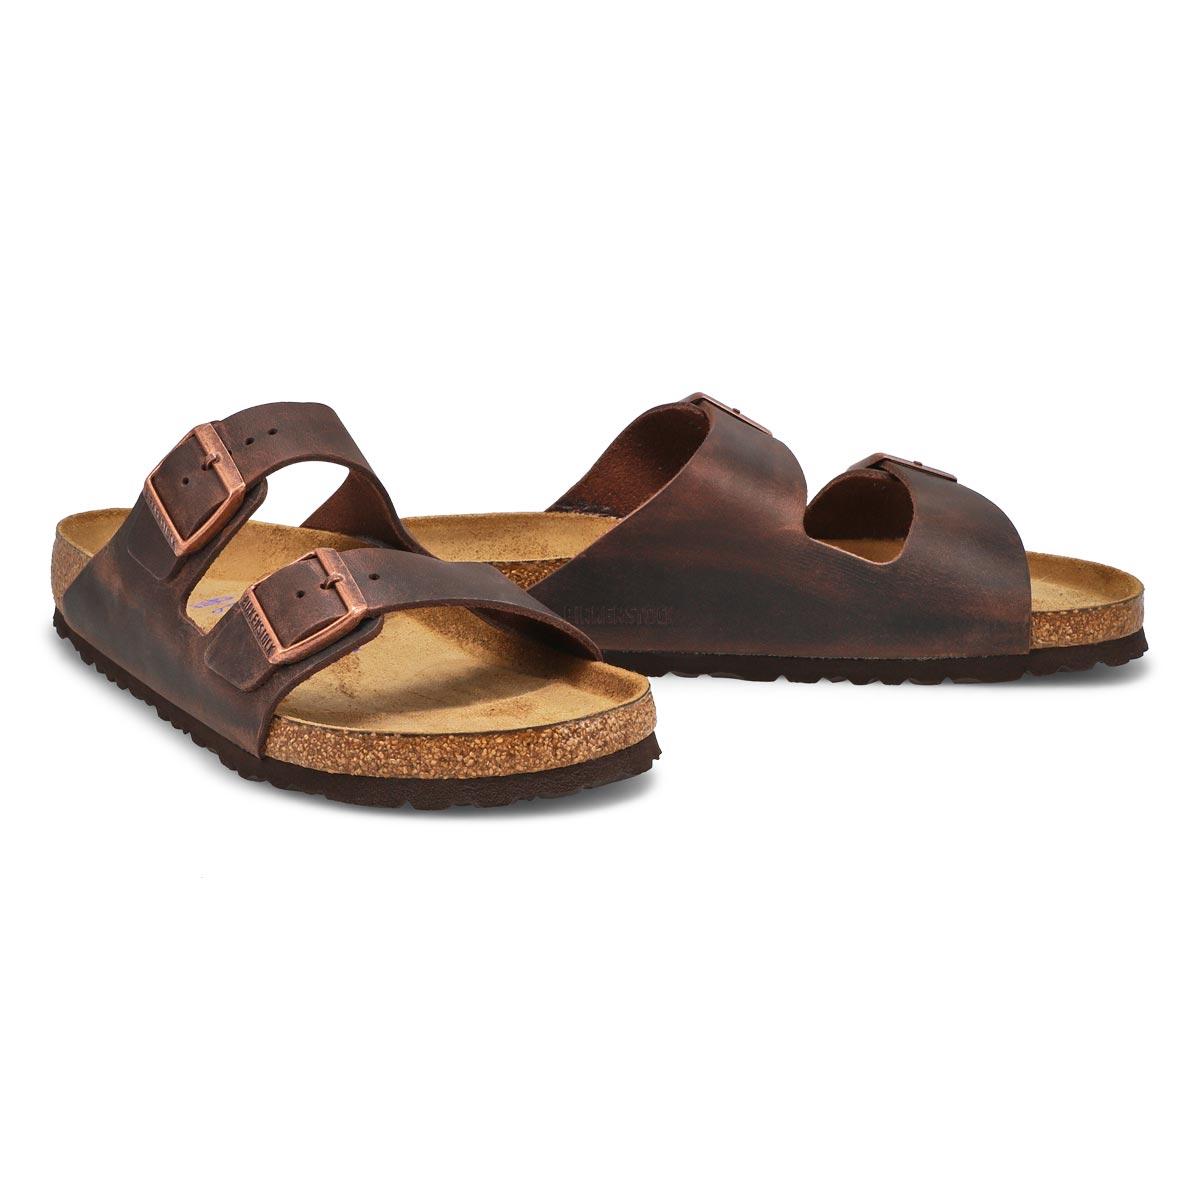 Mns Arizona SF havana 2 strap sandal